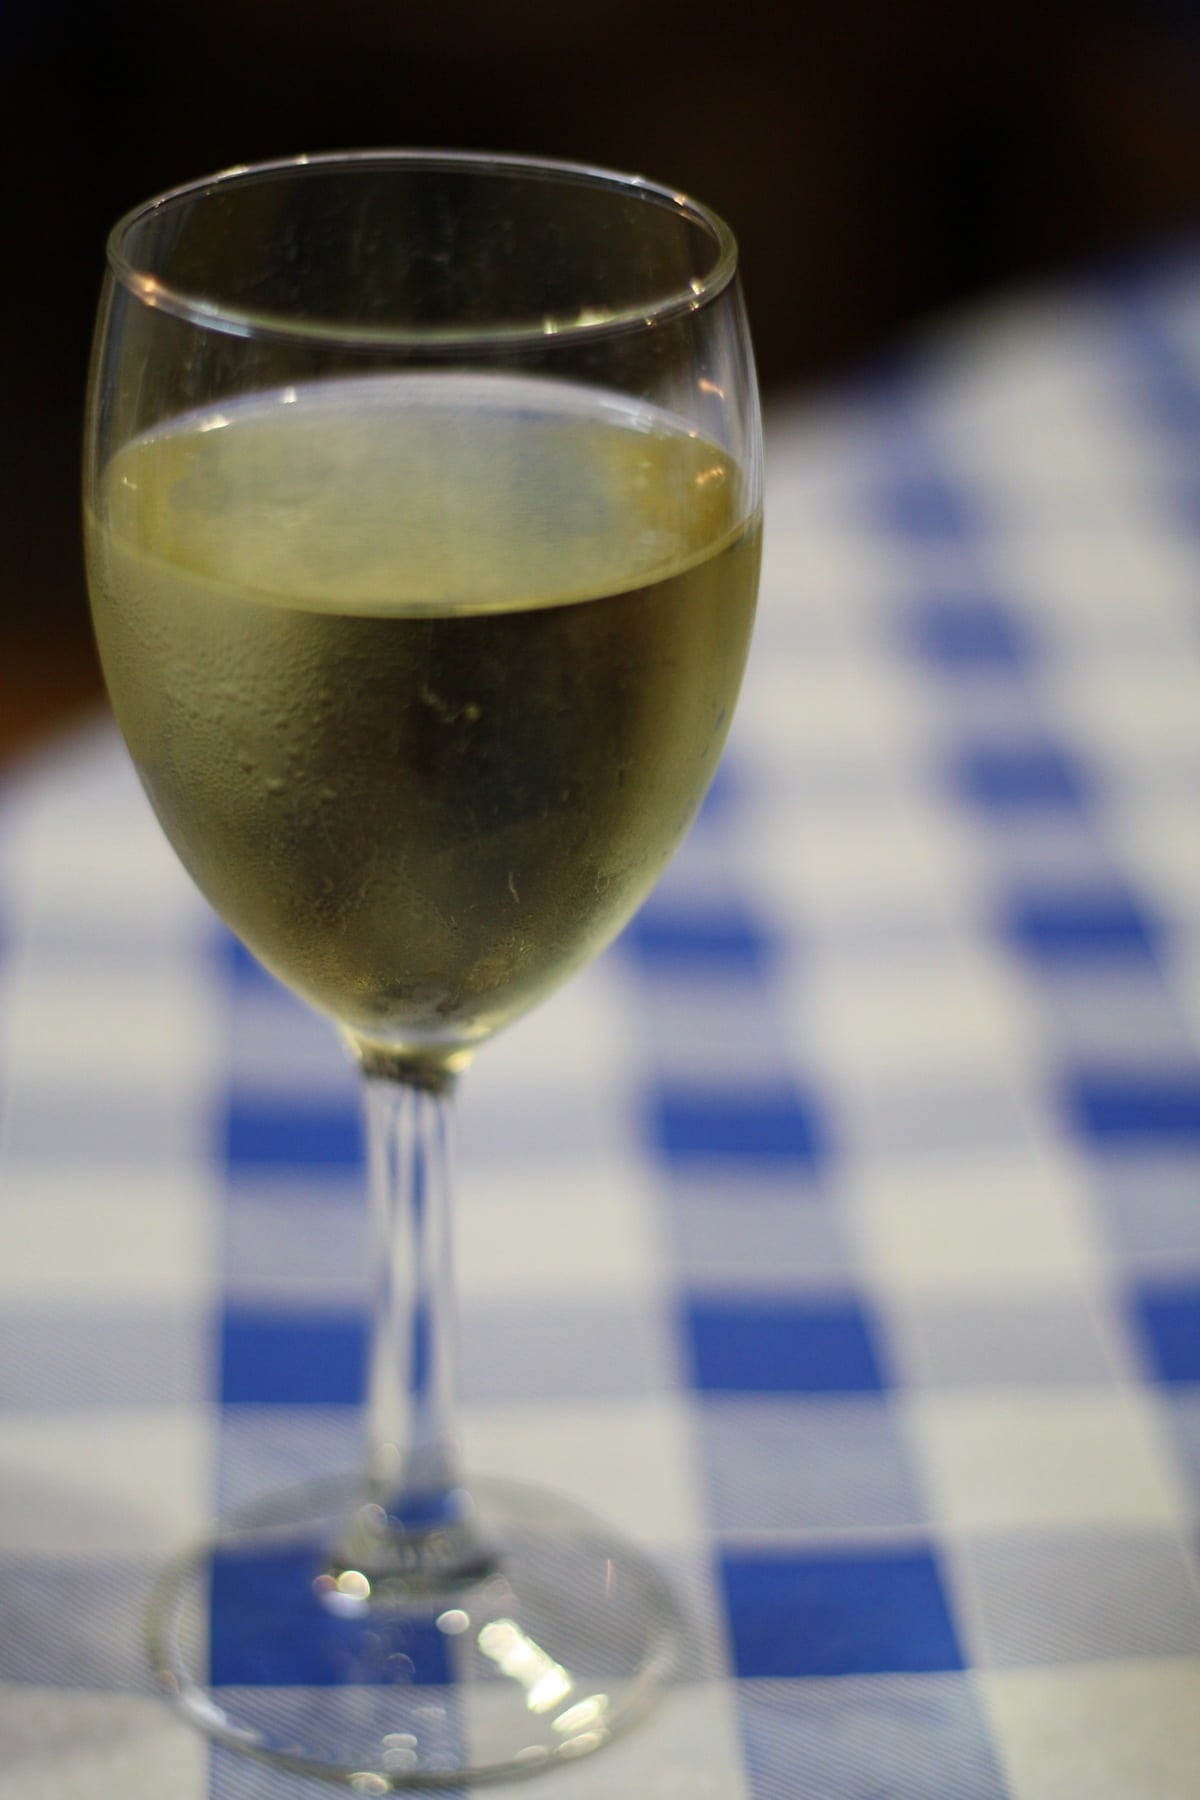 Taberna Griega: Authentic Greek Food in Madrid